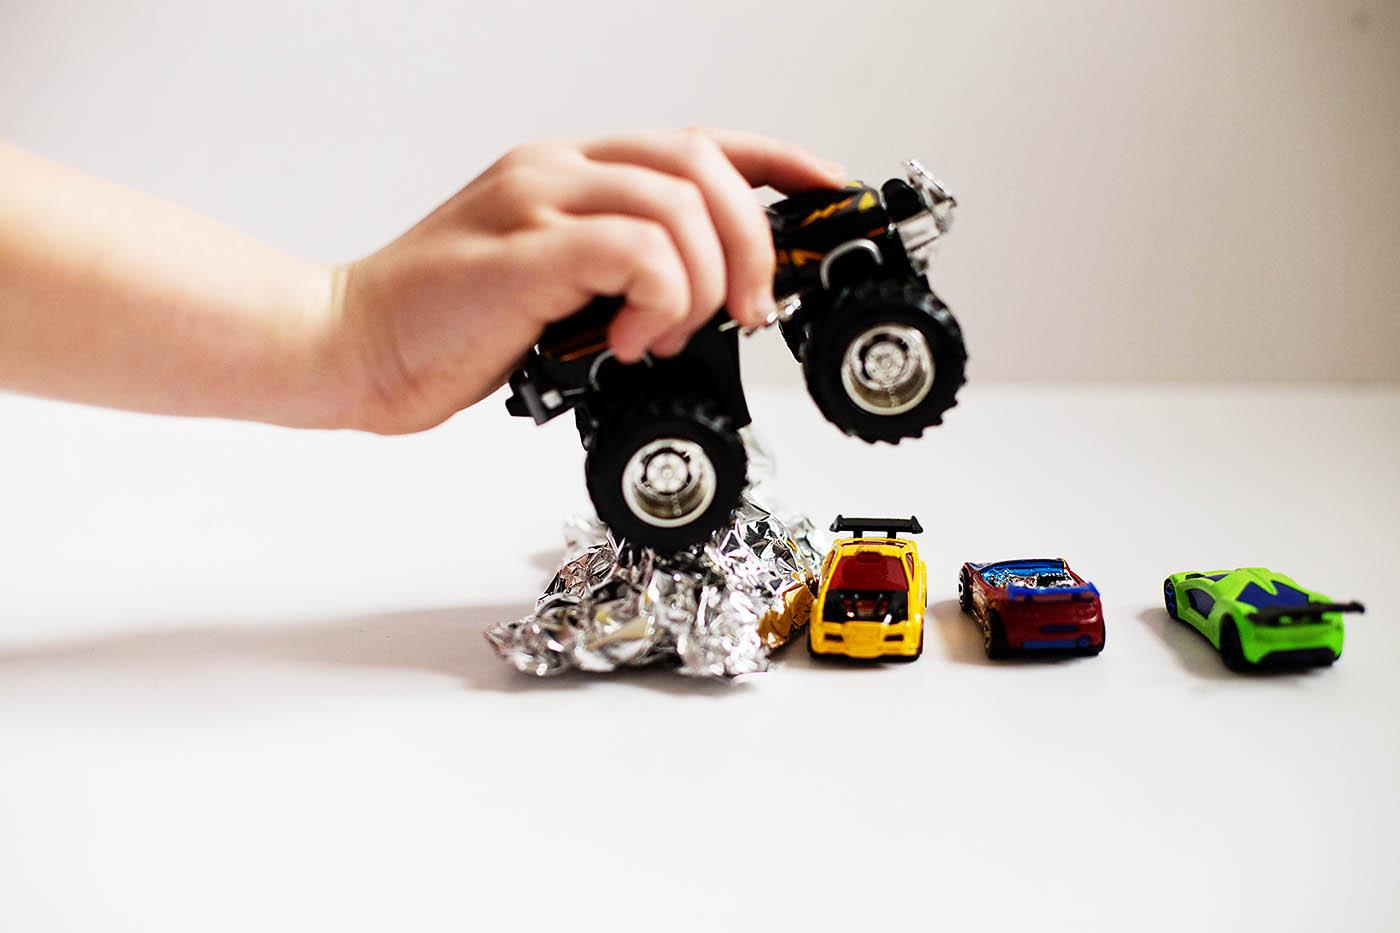 Monster truck smash activity